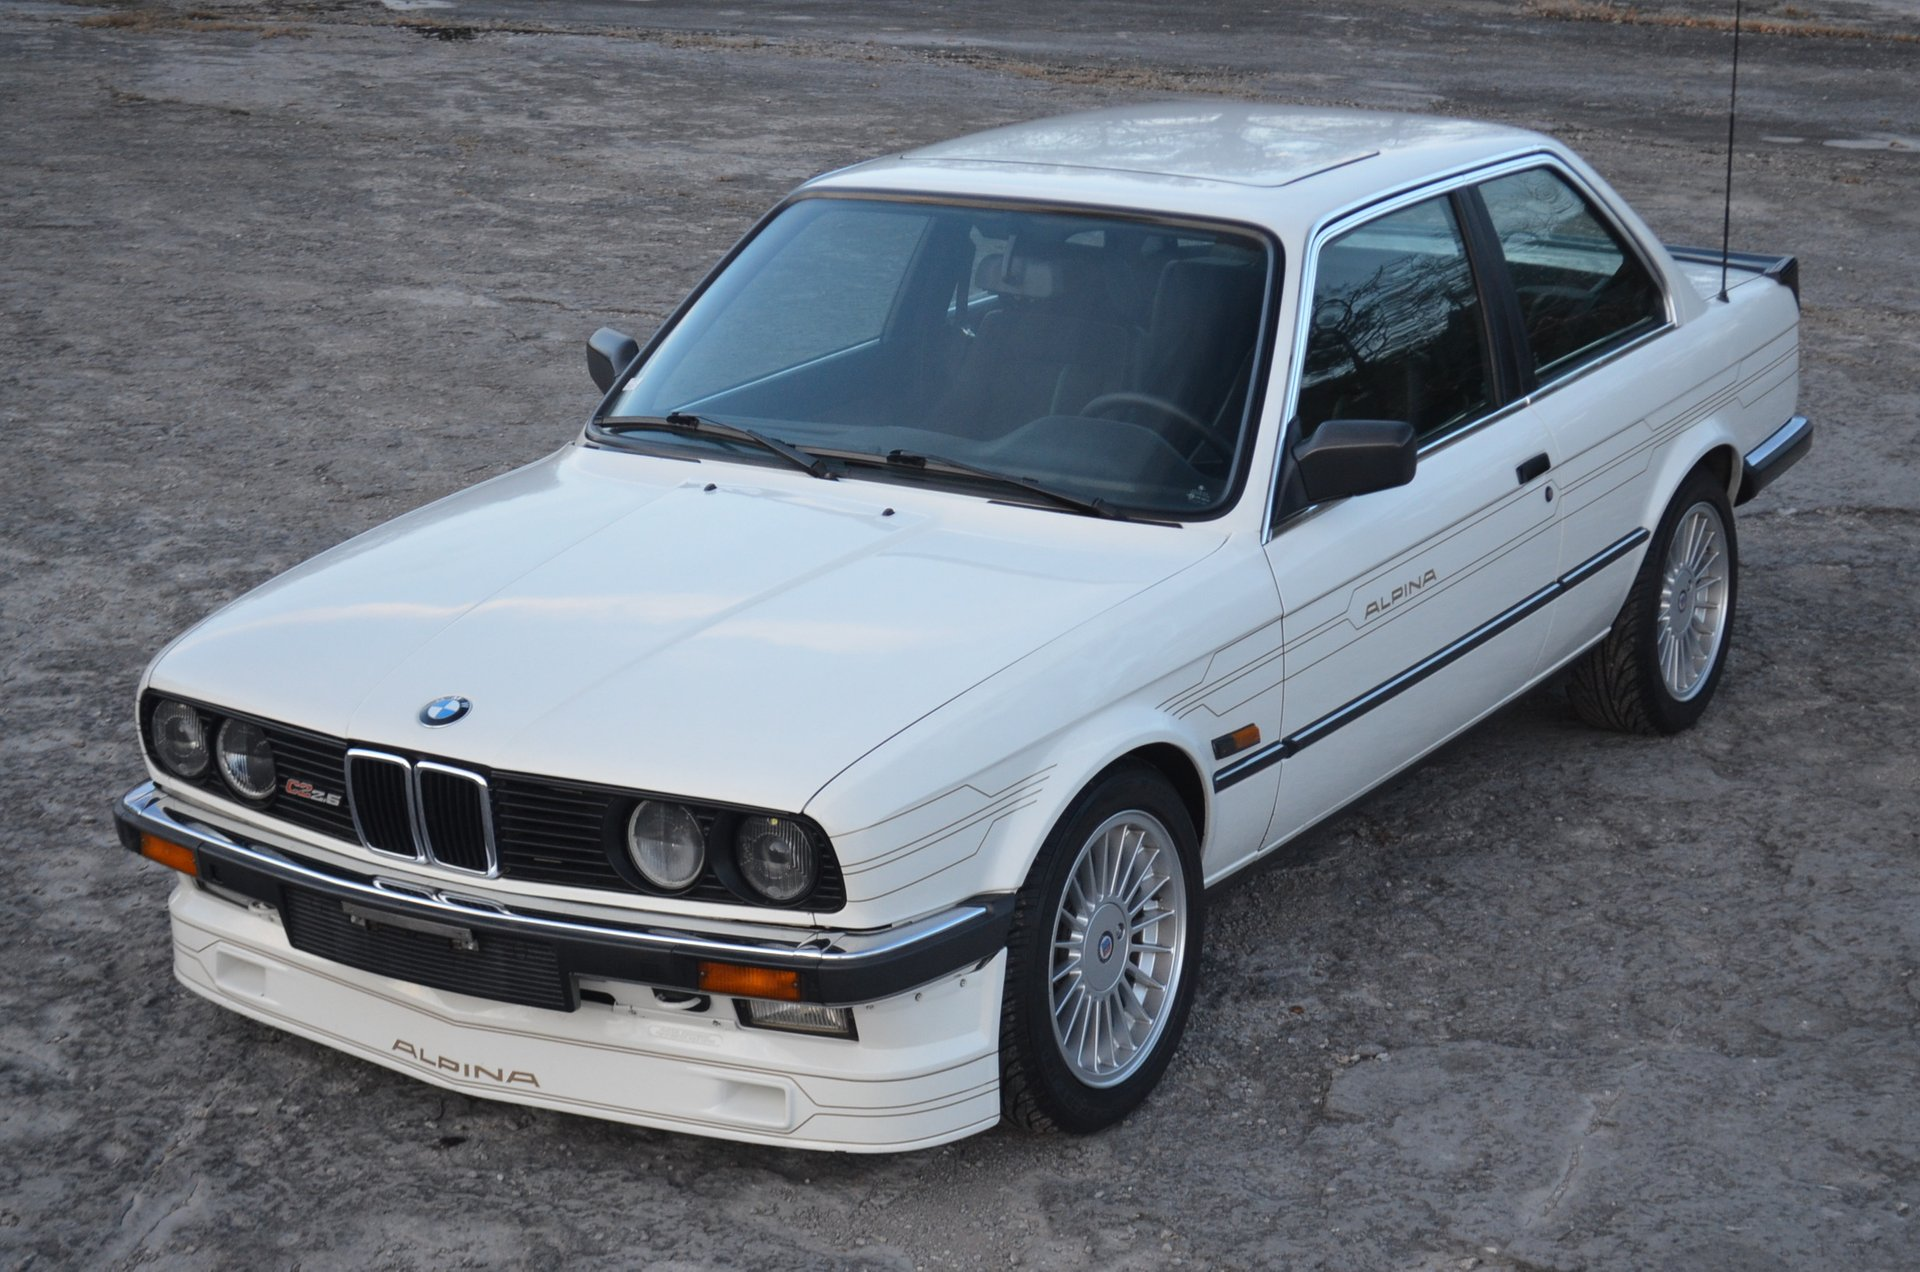 1987 bmw alpina c2 2 5